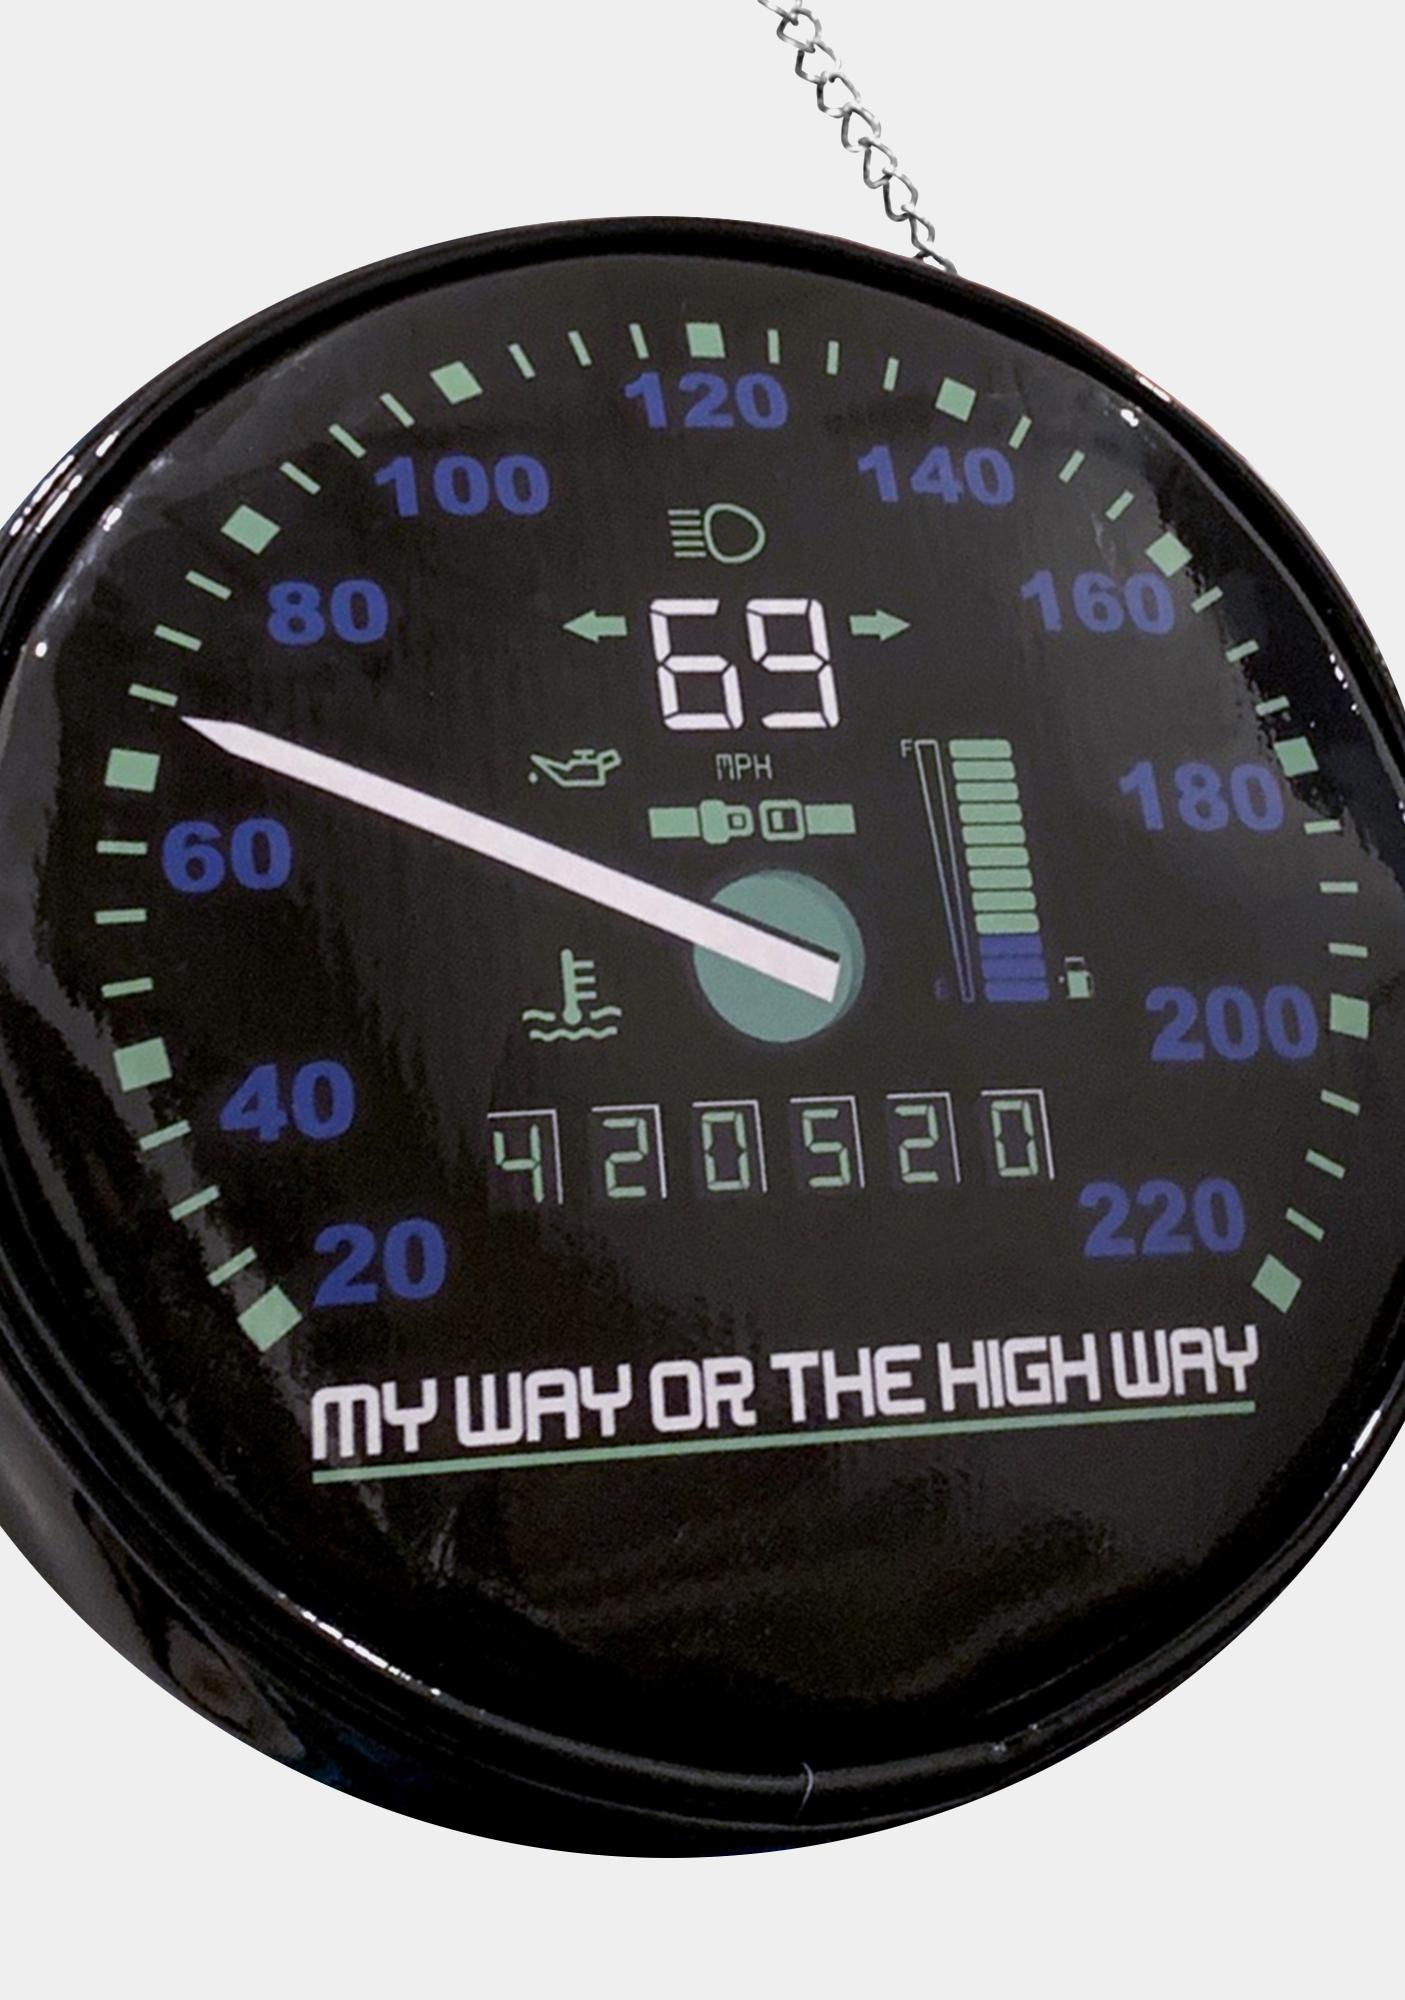 HOROSCOPEZ Need For Speed Crossbody Bag